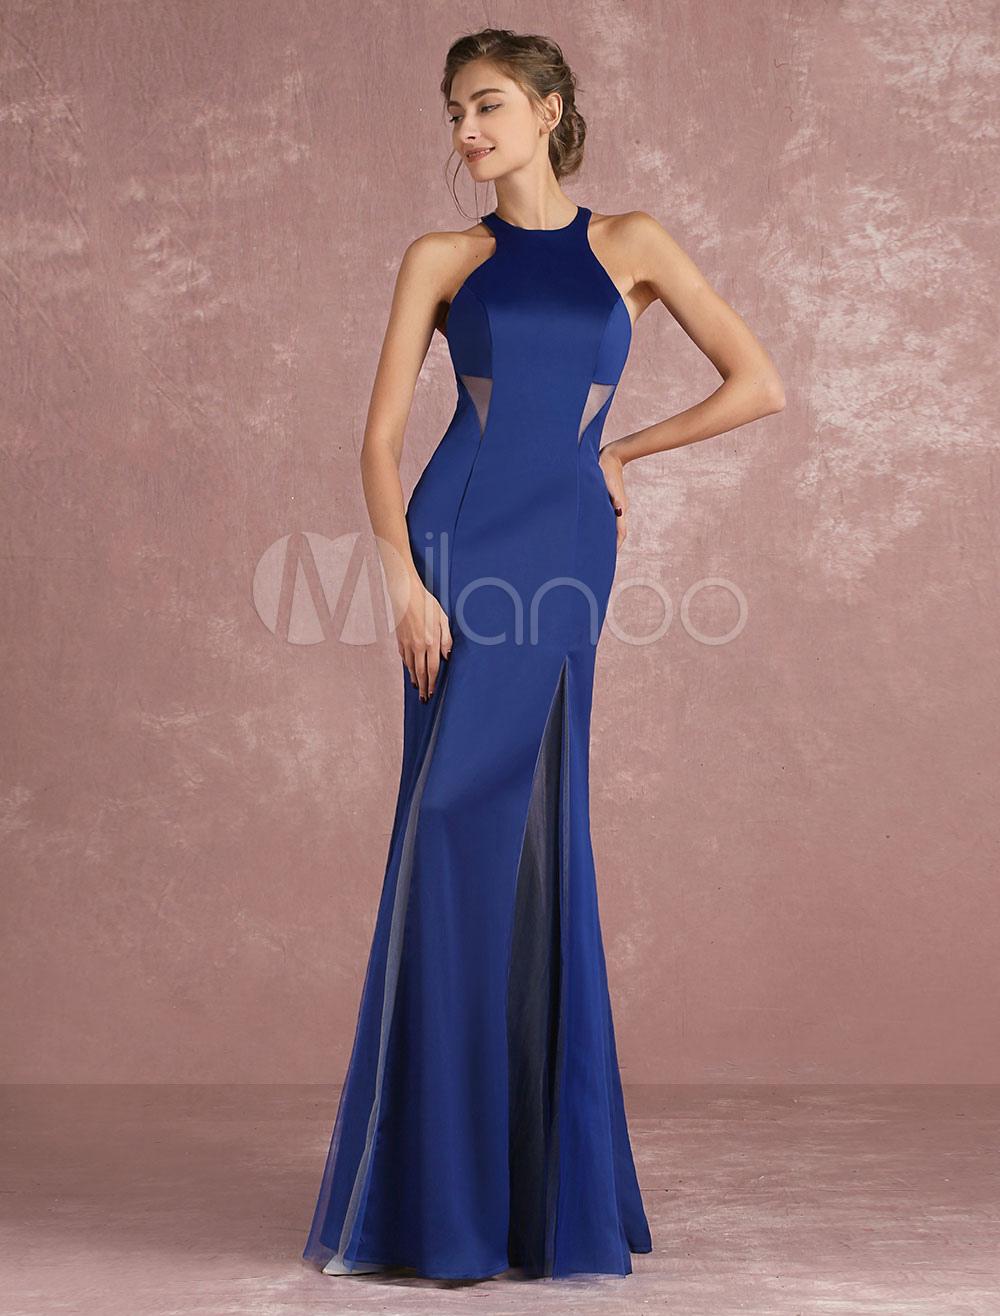 Halter Evening Dress Royal Blue Mermaid Formal Dress Satin High Split Floor Length Occasion Dress (Wedding Evening Dresses) photo